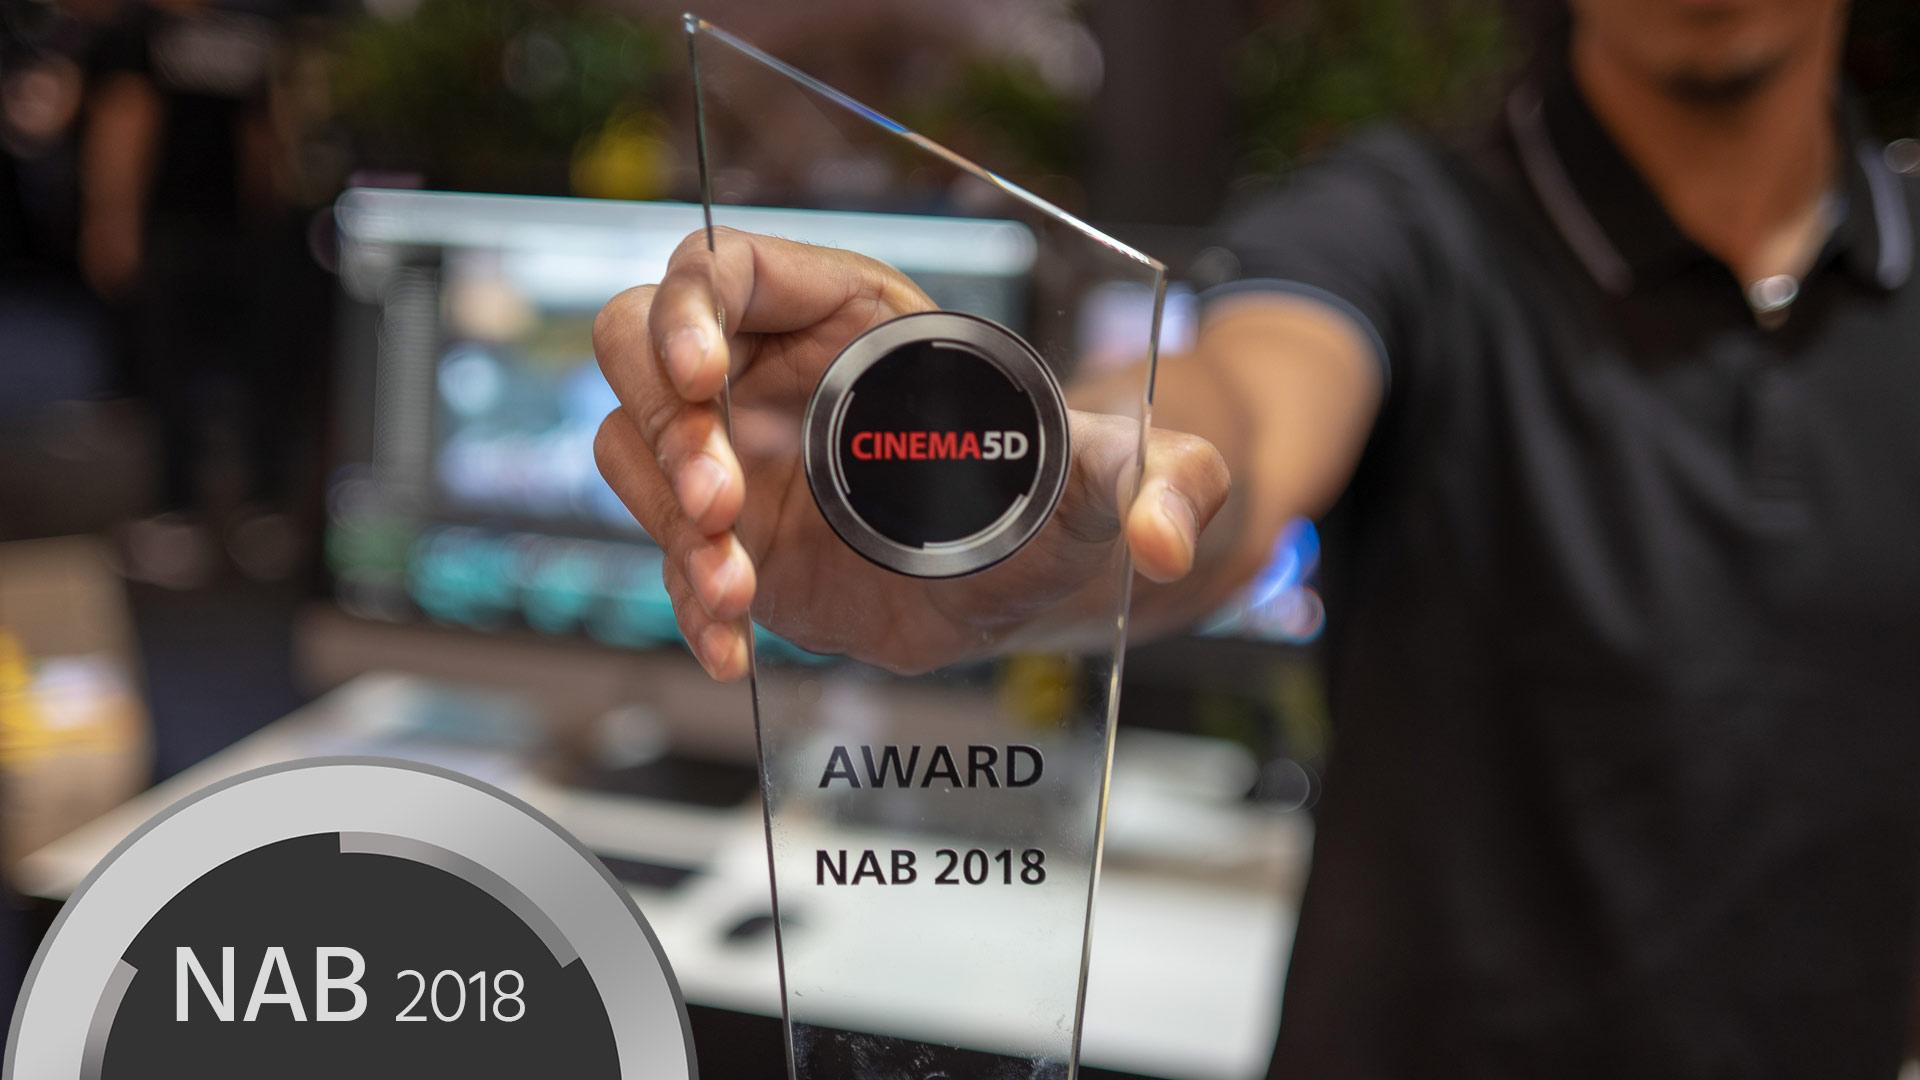 cinema5D NAB Awards 2018 - BMD Pocket Cinema Cam 4K